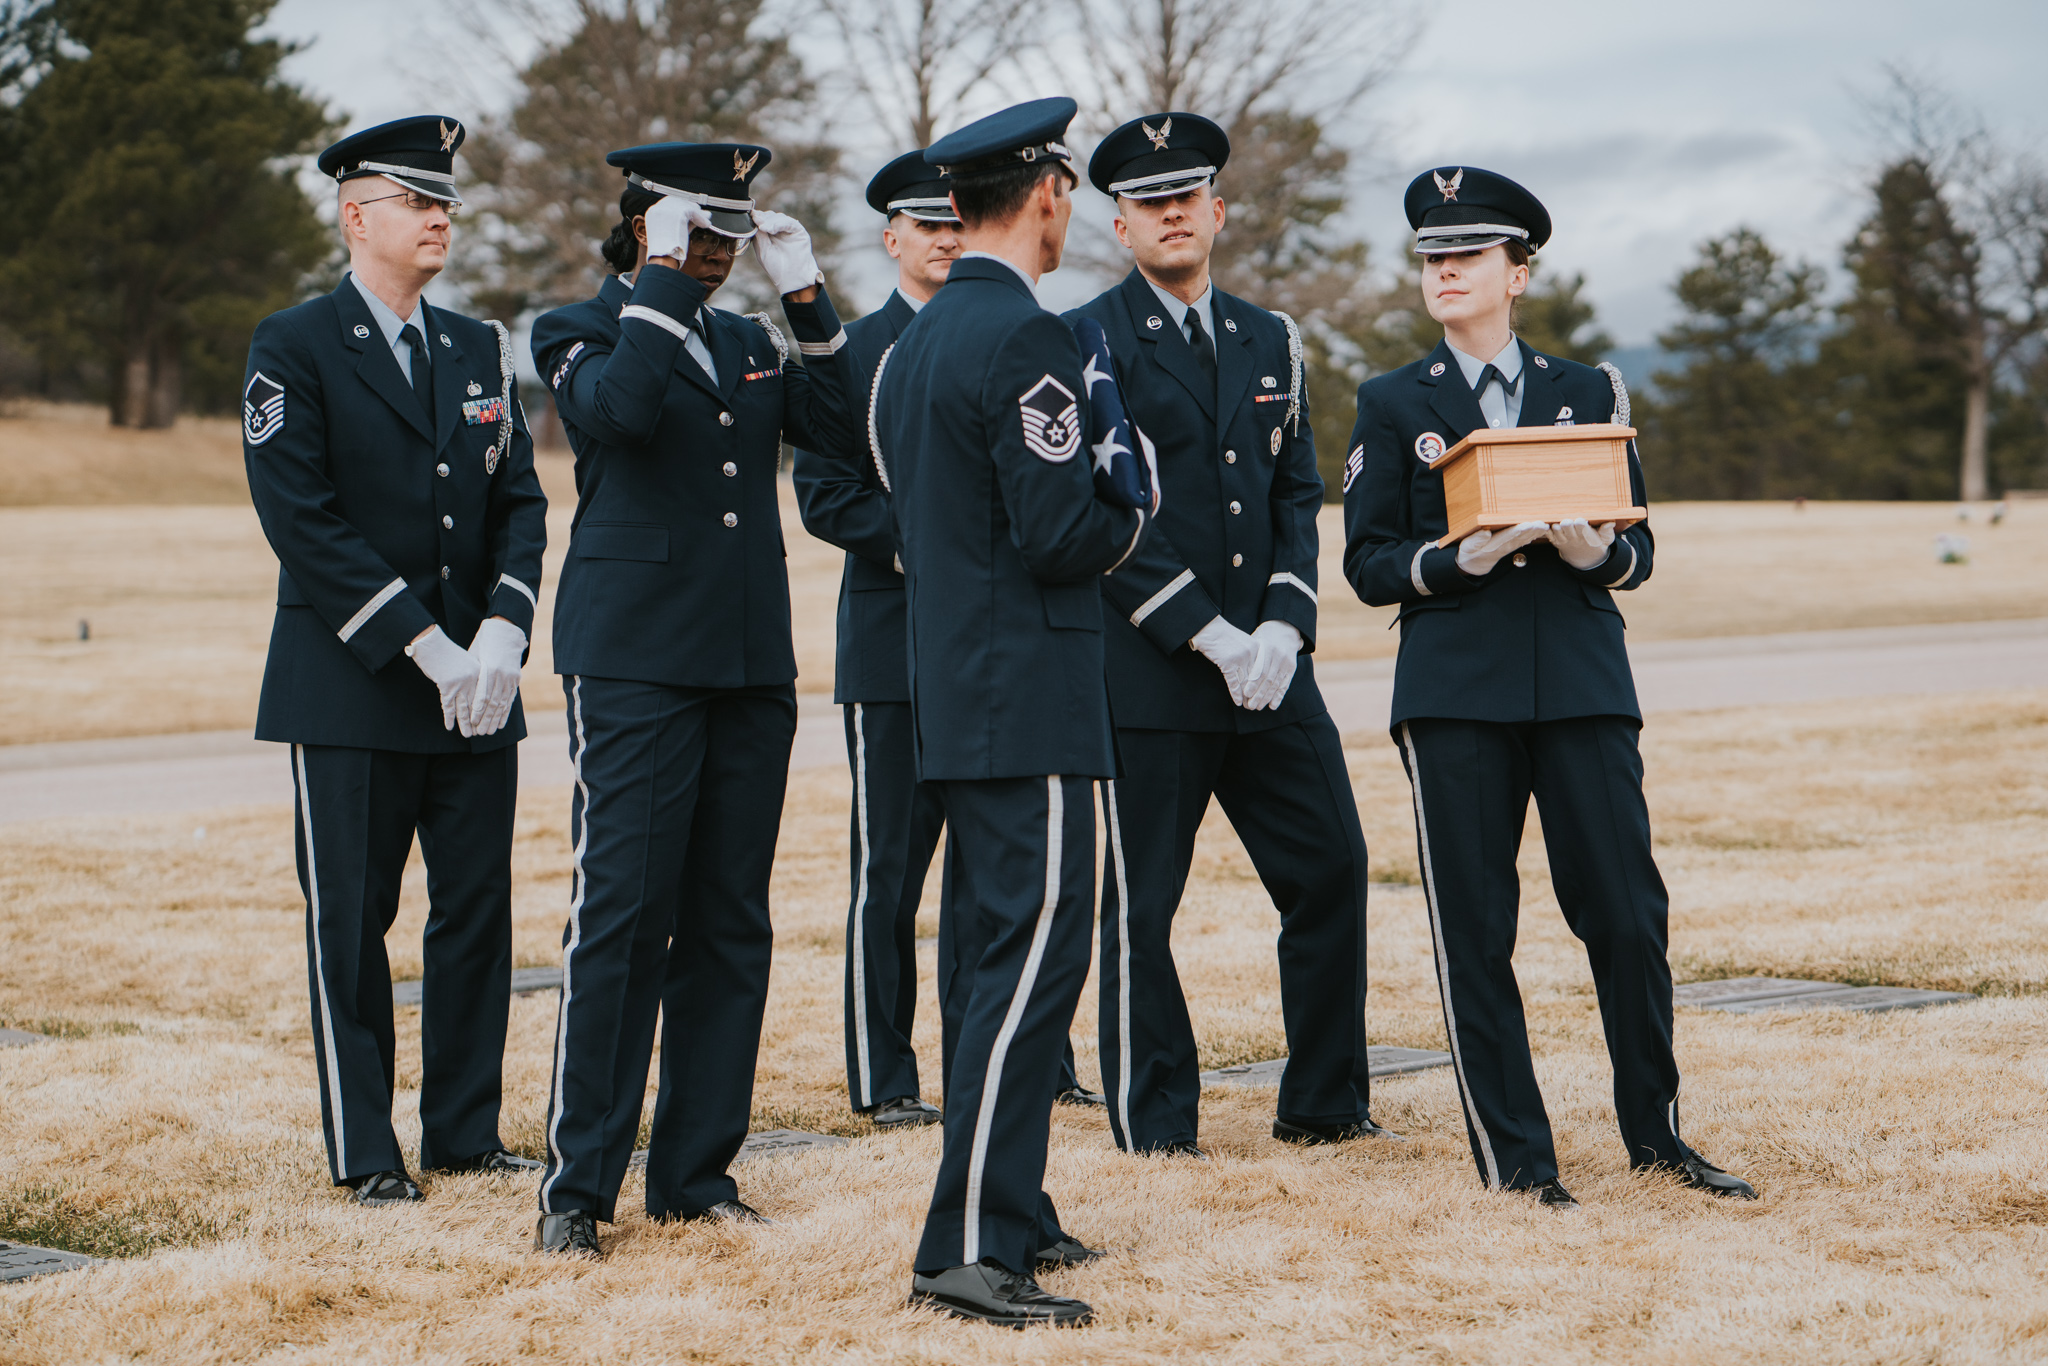 usafa-colorado-military-honours-burial-funeral-photography-grace-elizabeth-colchester-essex-alternative-wedding-lifestyle-photographer (9 of 127).jpg